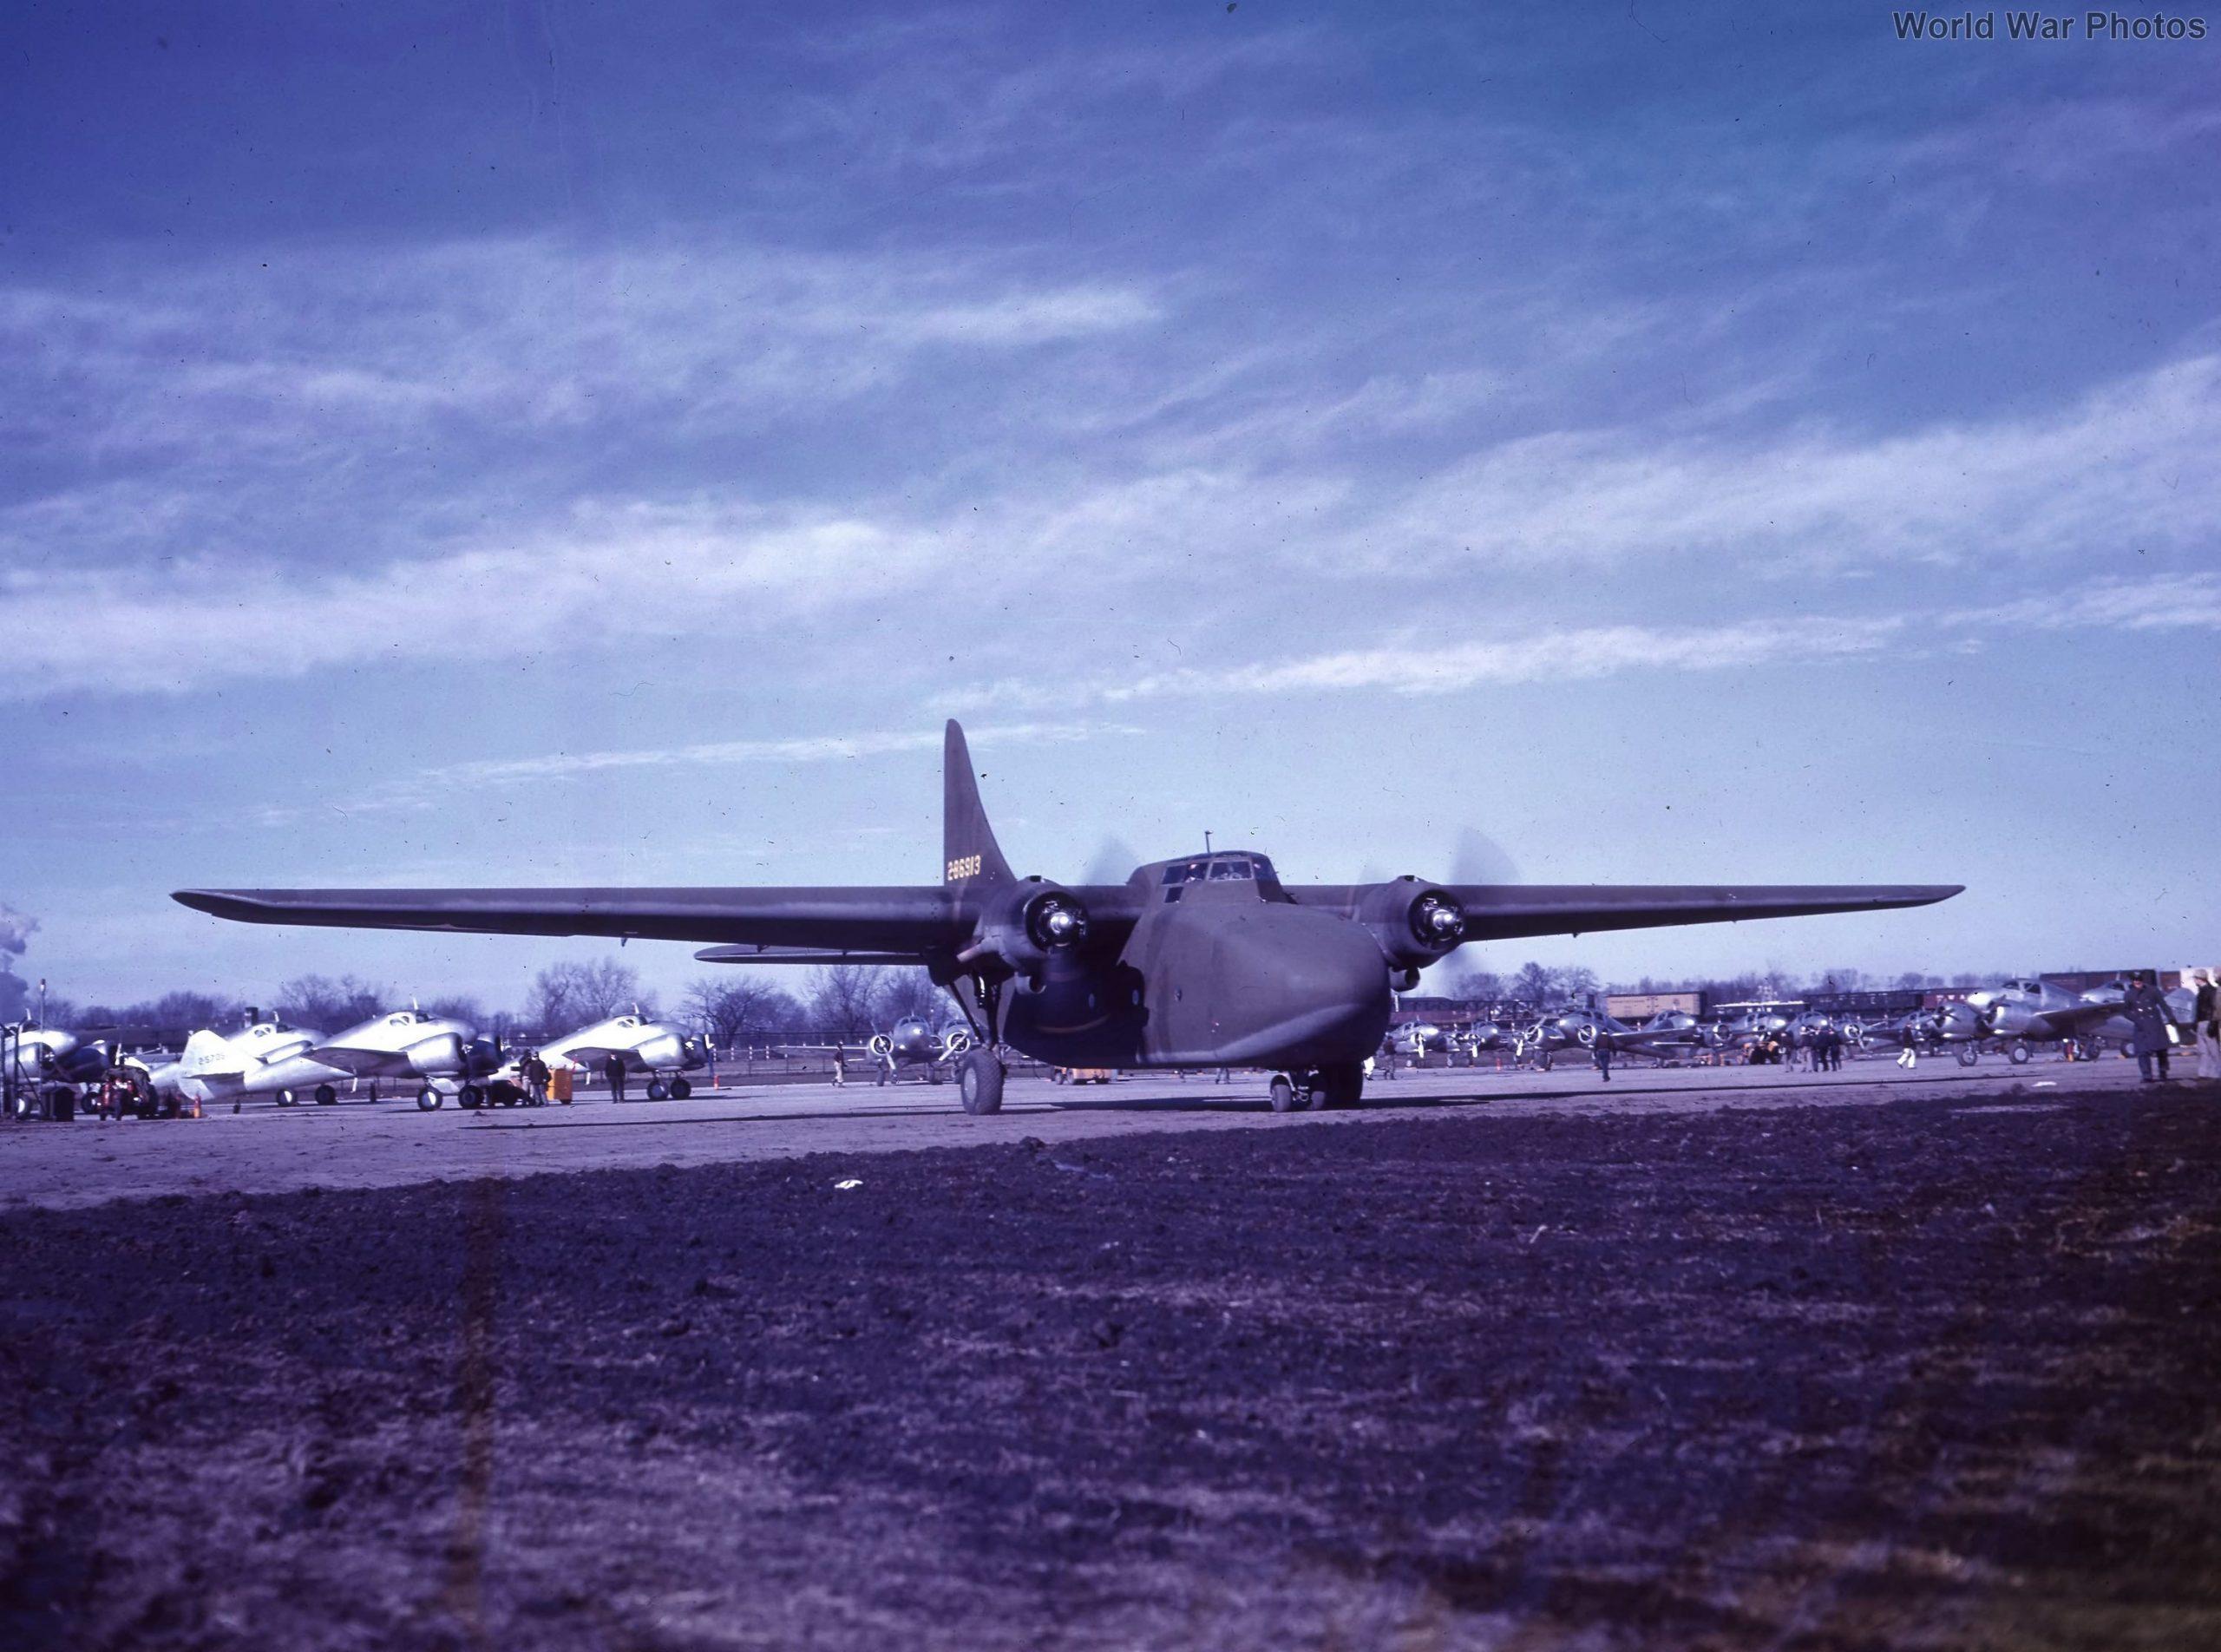 C-76 42-86913 3